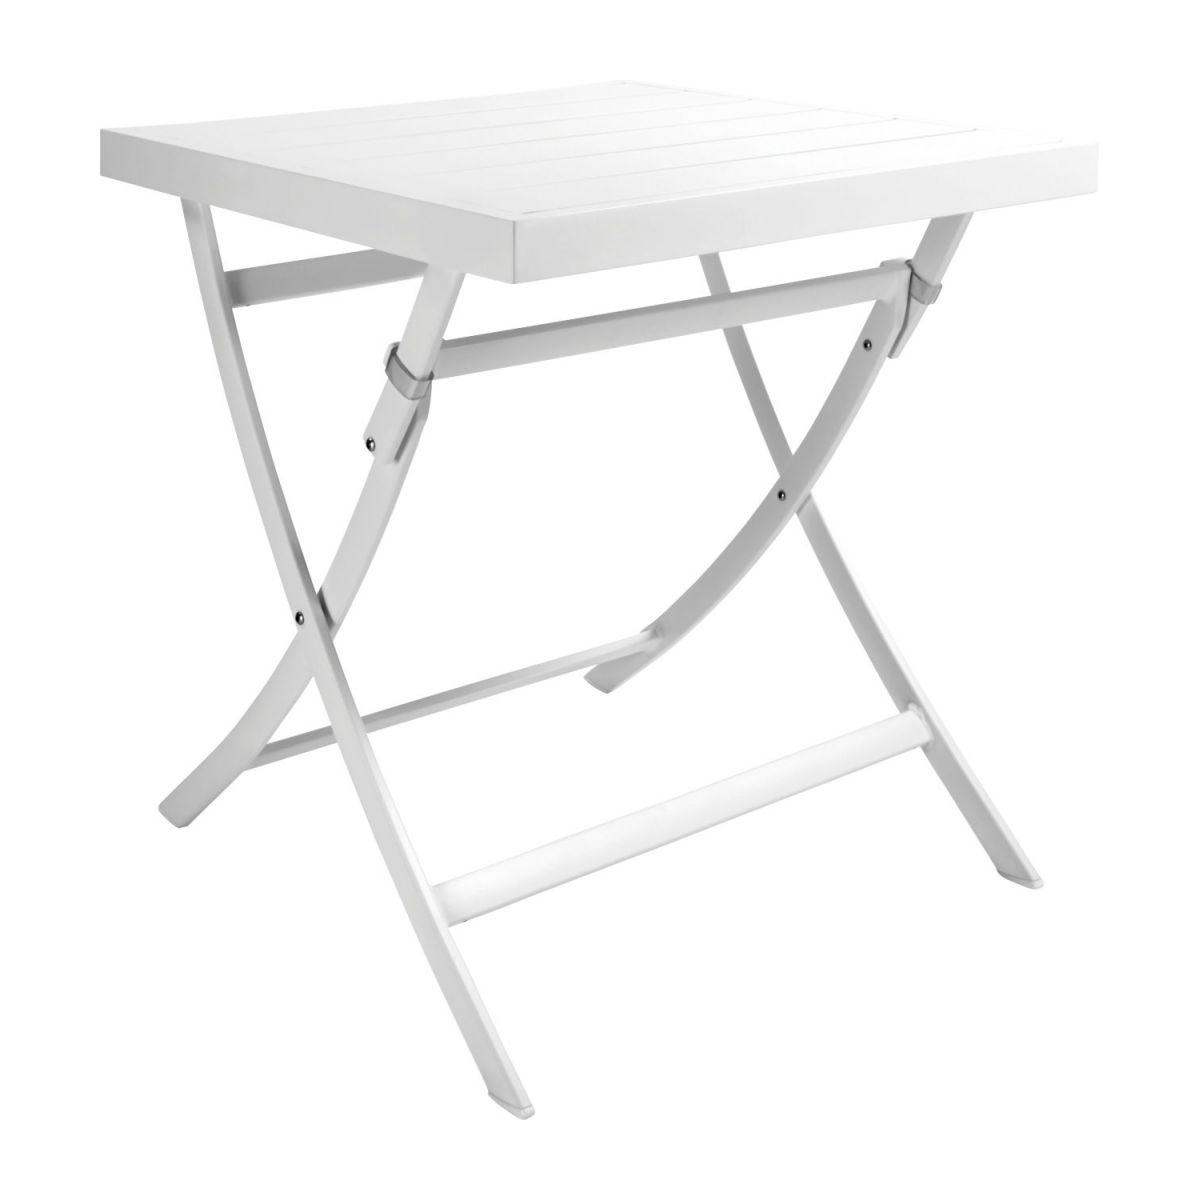 Table De Jardin Pliante Carrée En Aluminium Laqué Blanc intérieur Table De Jardin Metal Pliante